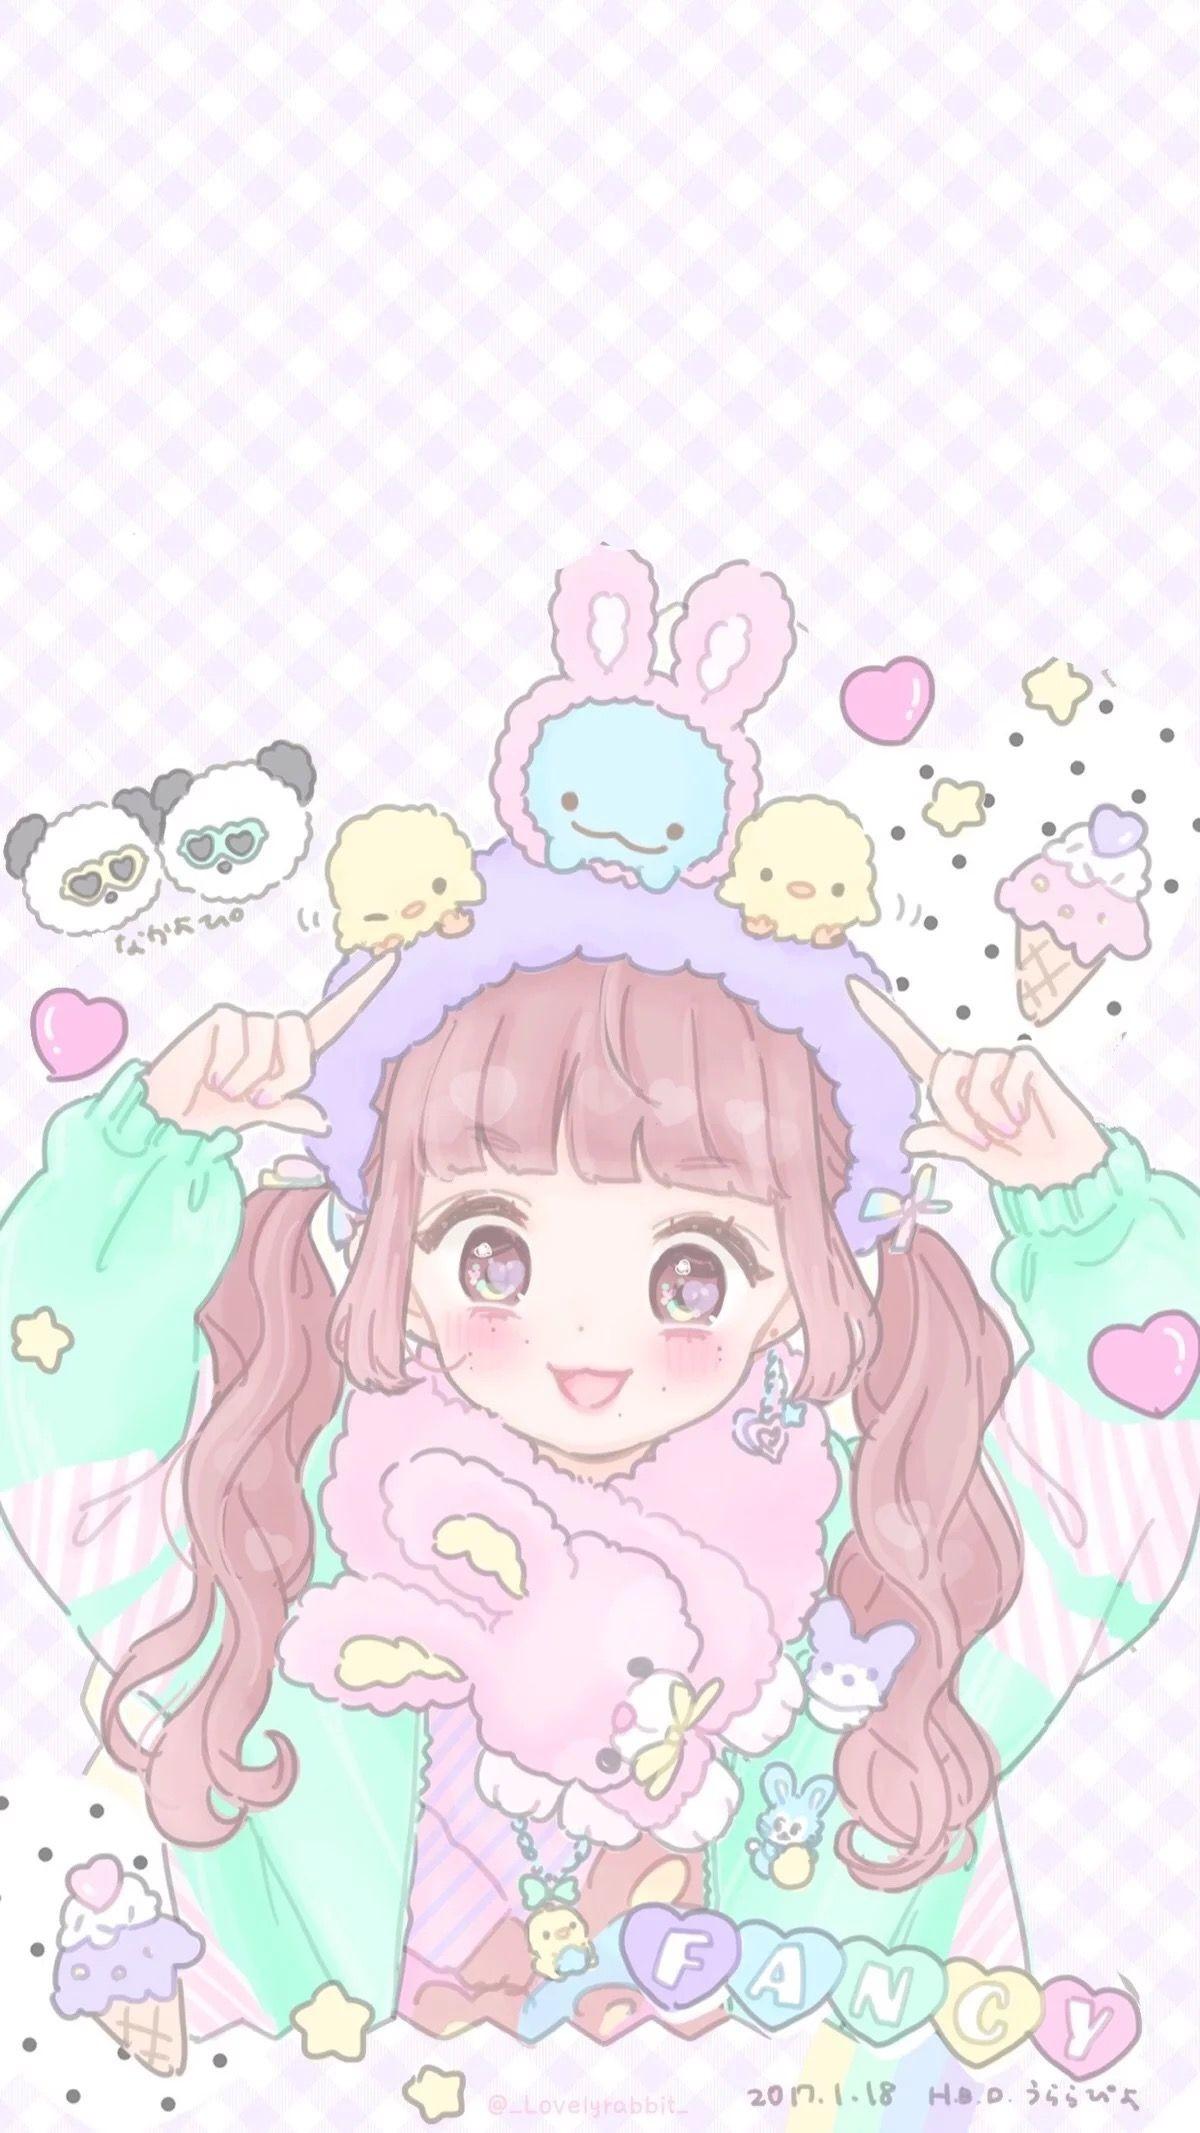 Res: 1200x2133, Kawaii Art, Kawaii Anime, Kawaii Drawings, Kawaii Wallpaper, Pastel Art,  Melanie Martinez, Phone Wallpapers, Fairy Oak, Anime Art